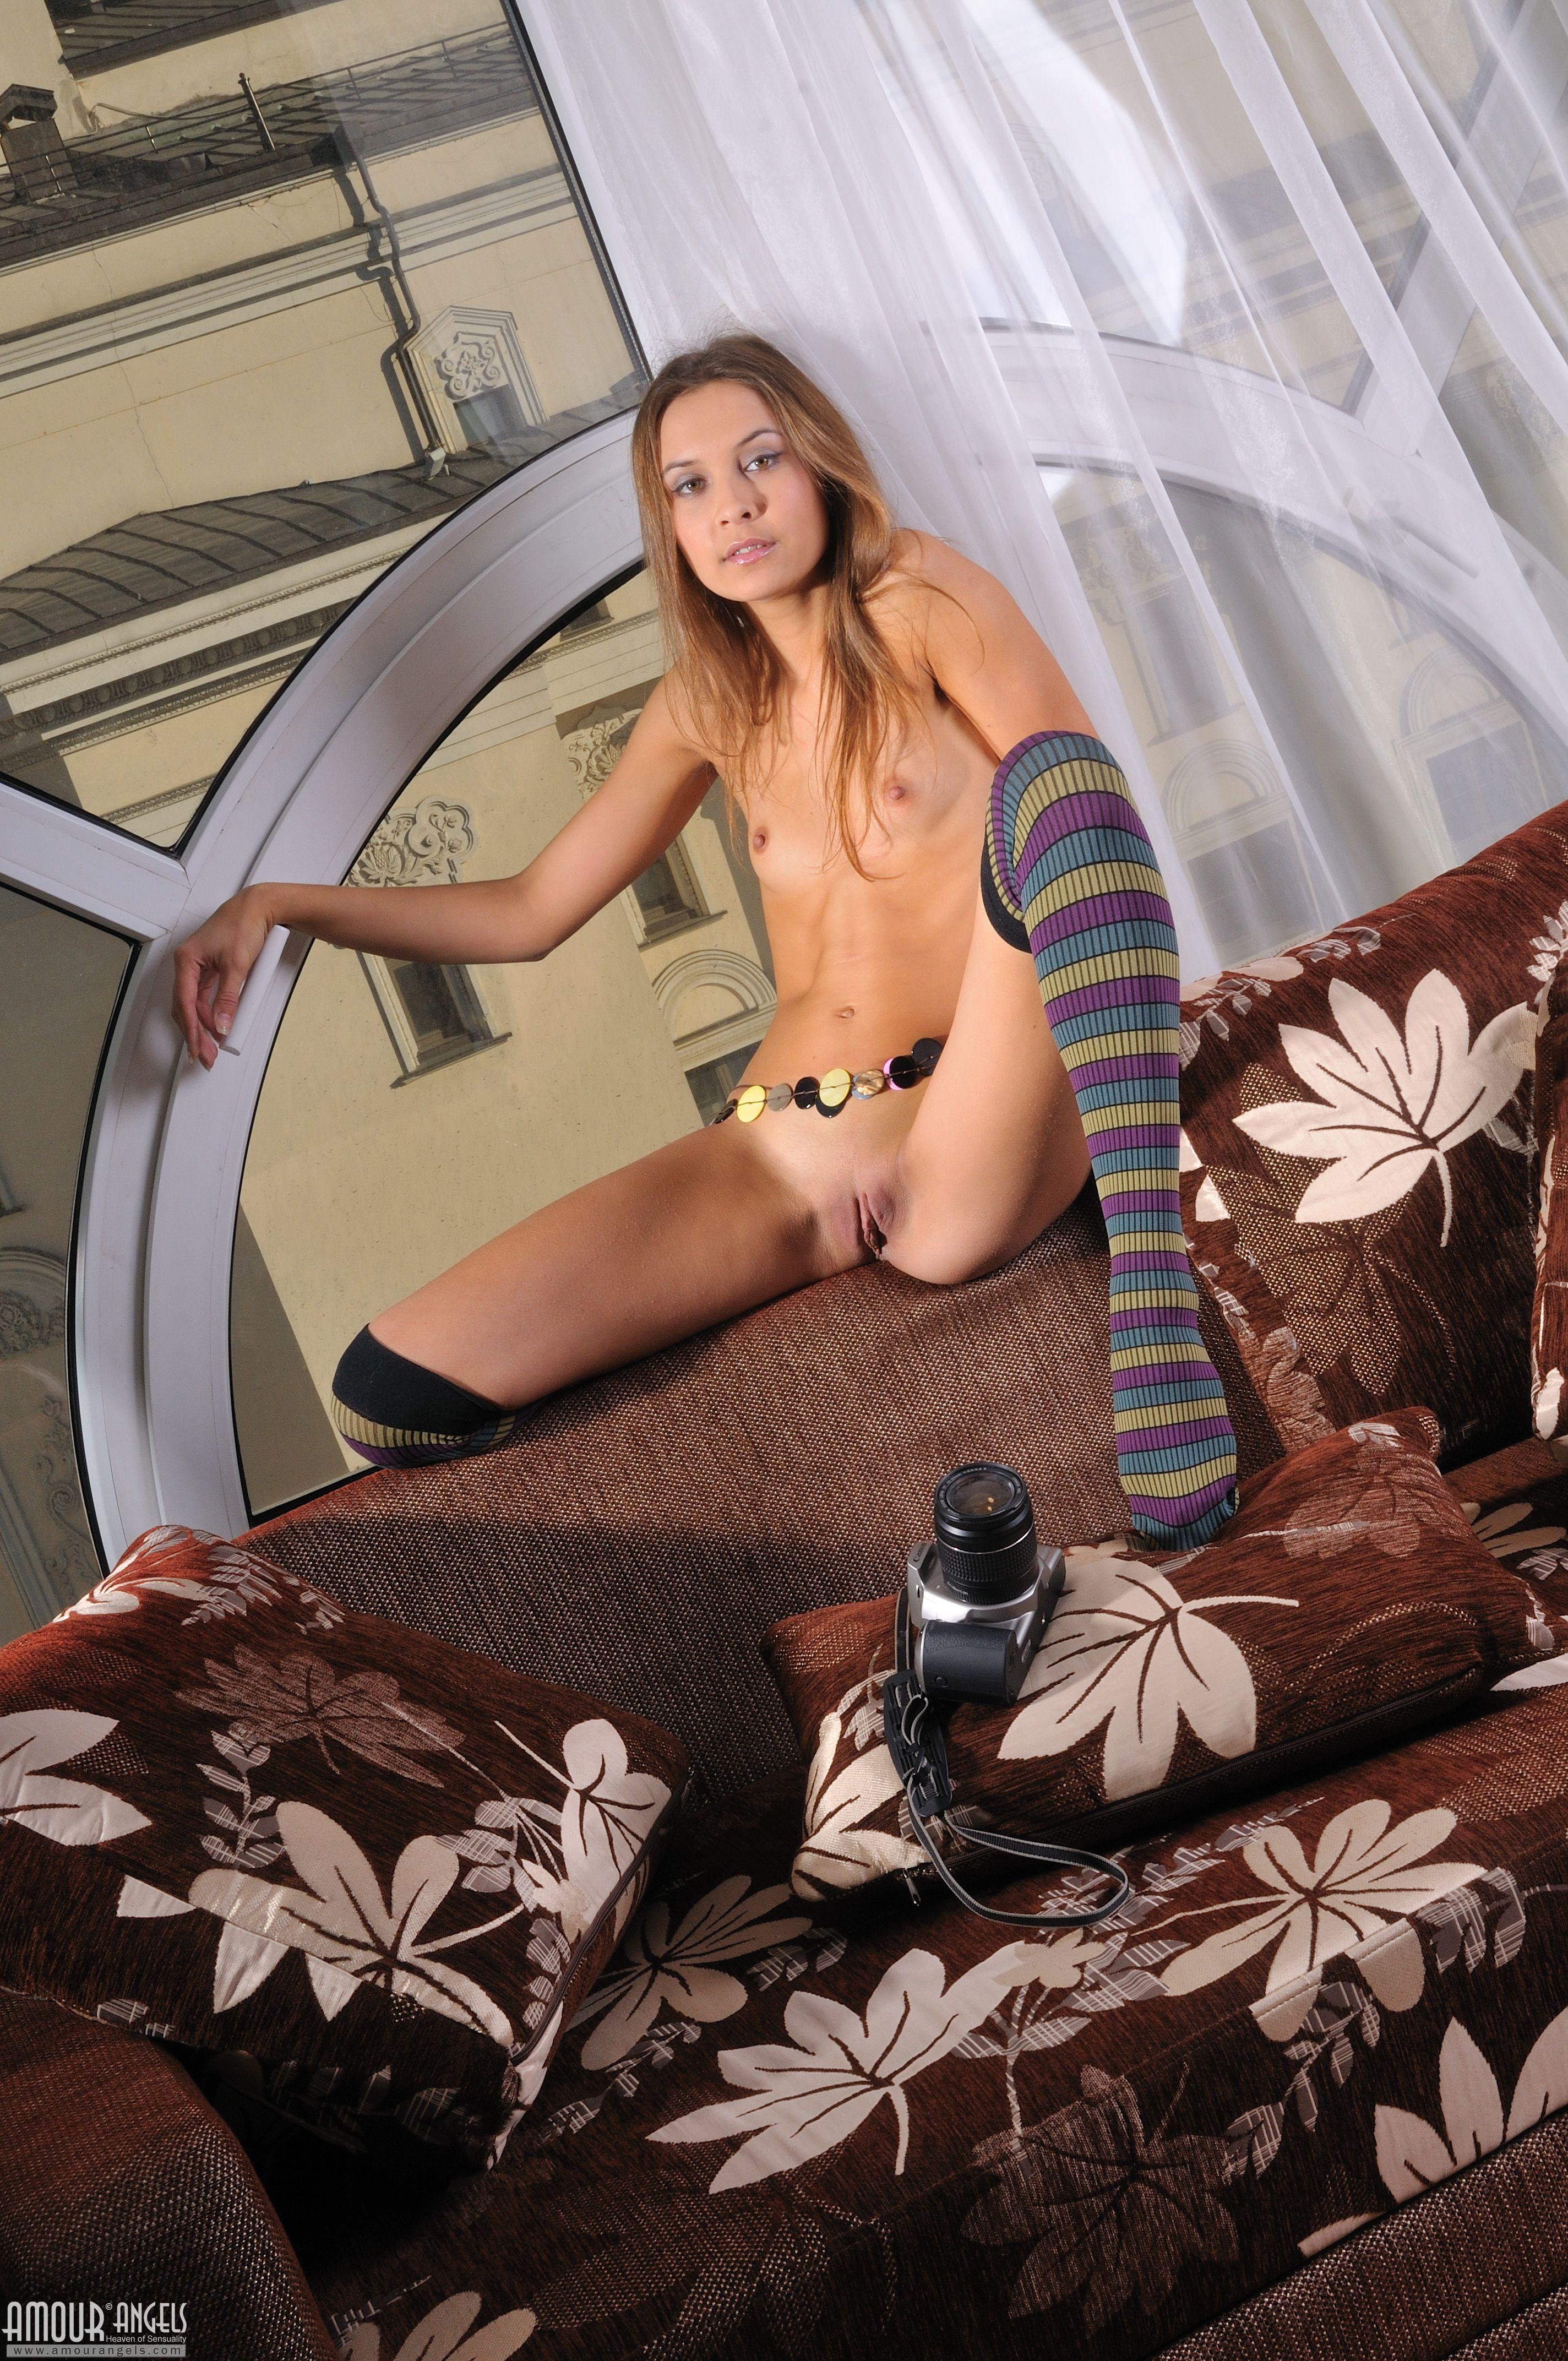 http://i3.imageban.ru/out/2014/03/09/373abae07cc0e3327935c648285cf05d.jpg